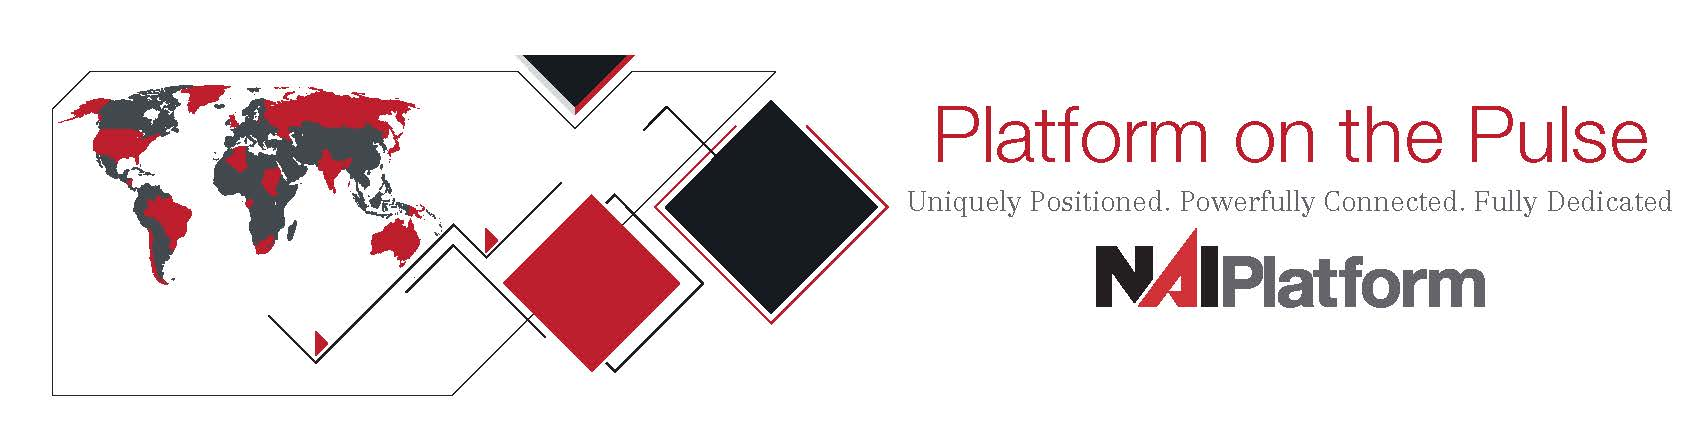 Platform On The Pulse